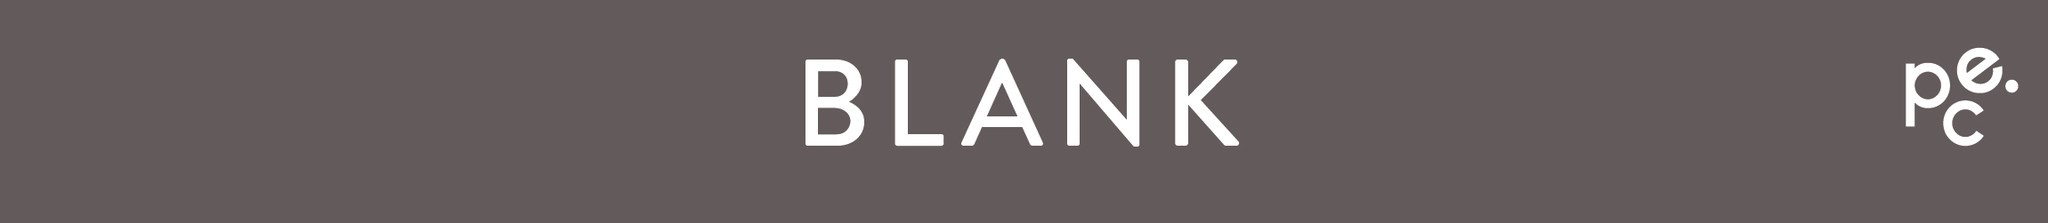 Strip - Blank|Paper E. Clips